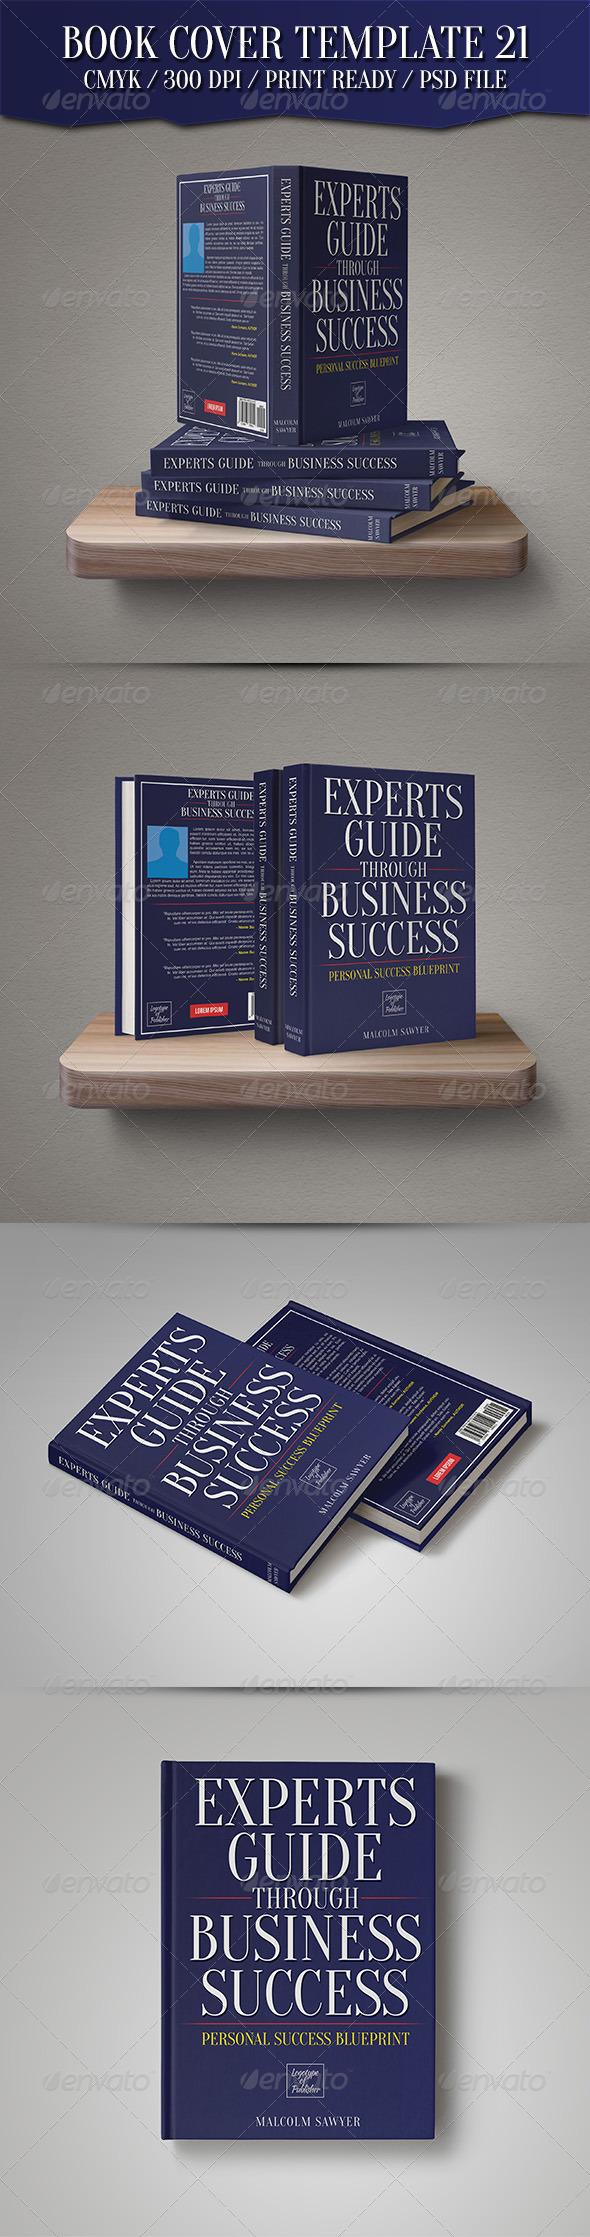 Book Cover Vector Design Psd ~ Realistic graphic download ai psd vector graphic